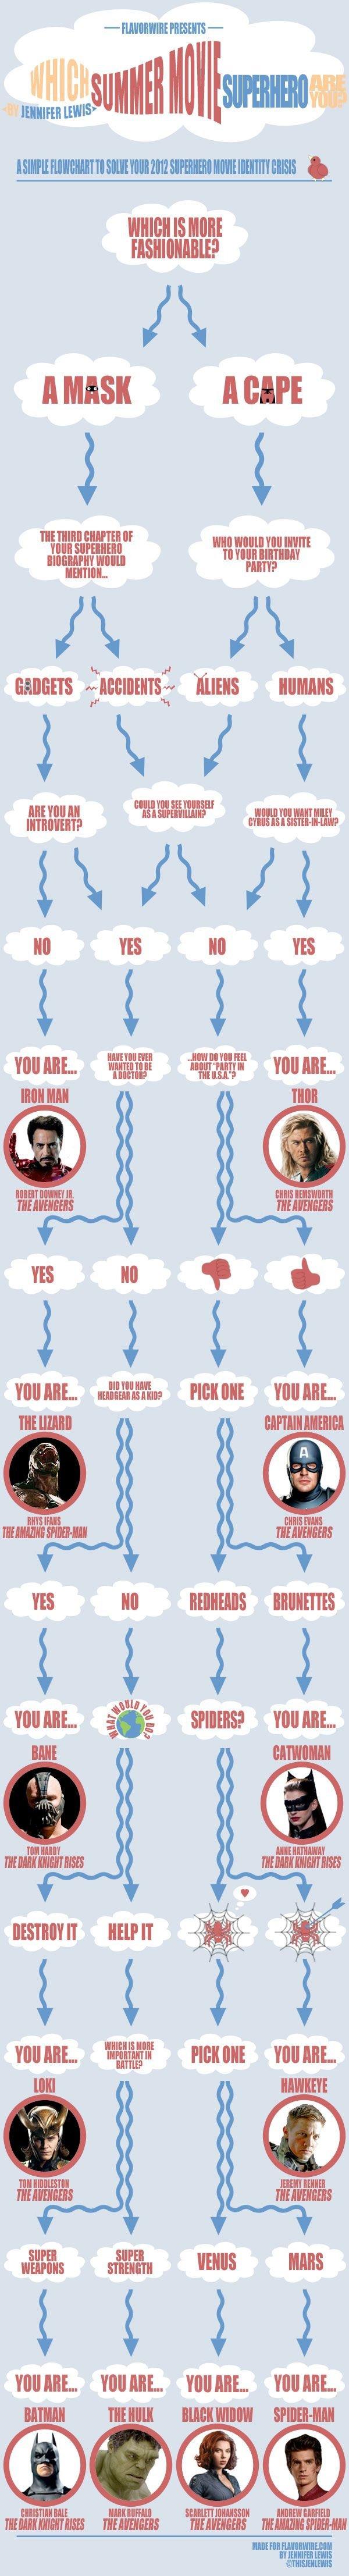 Which Super-Hero Are You?